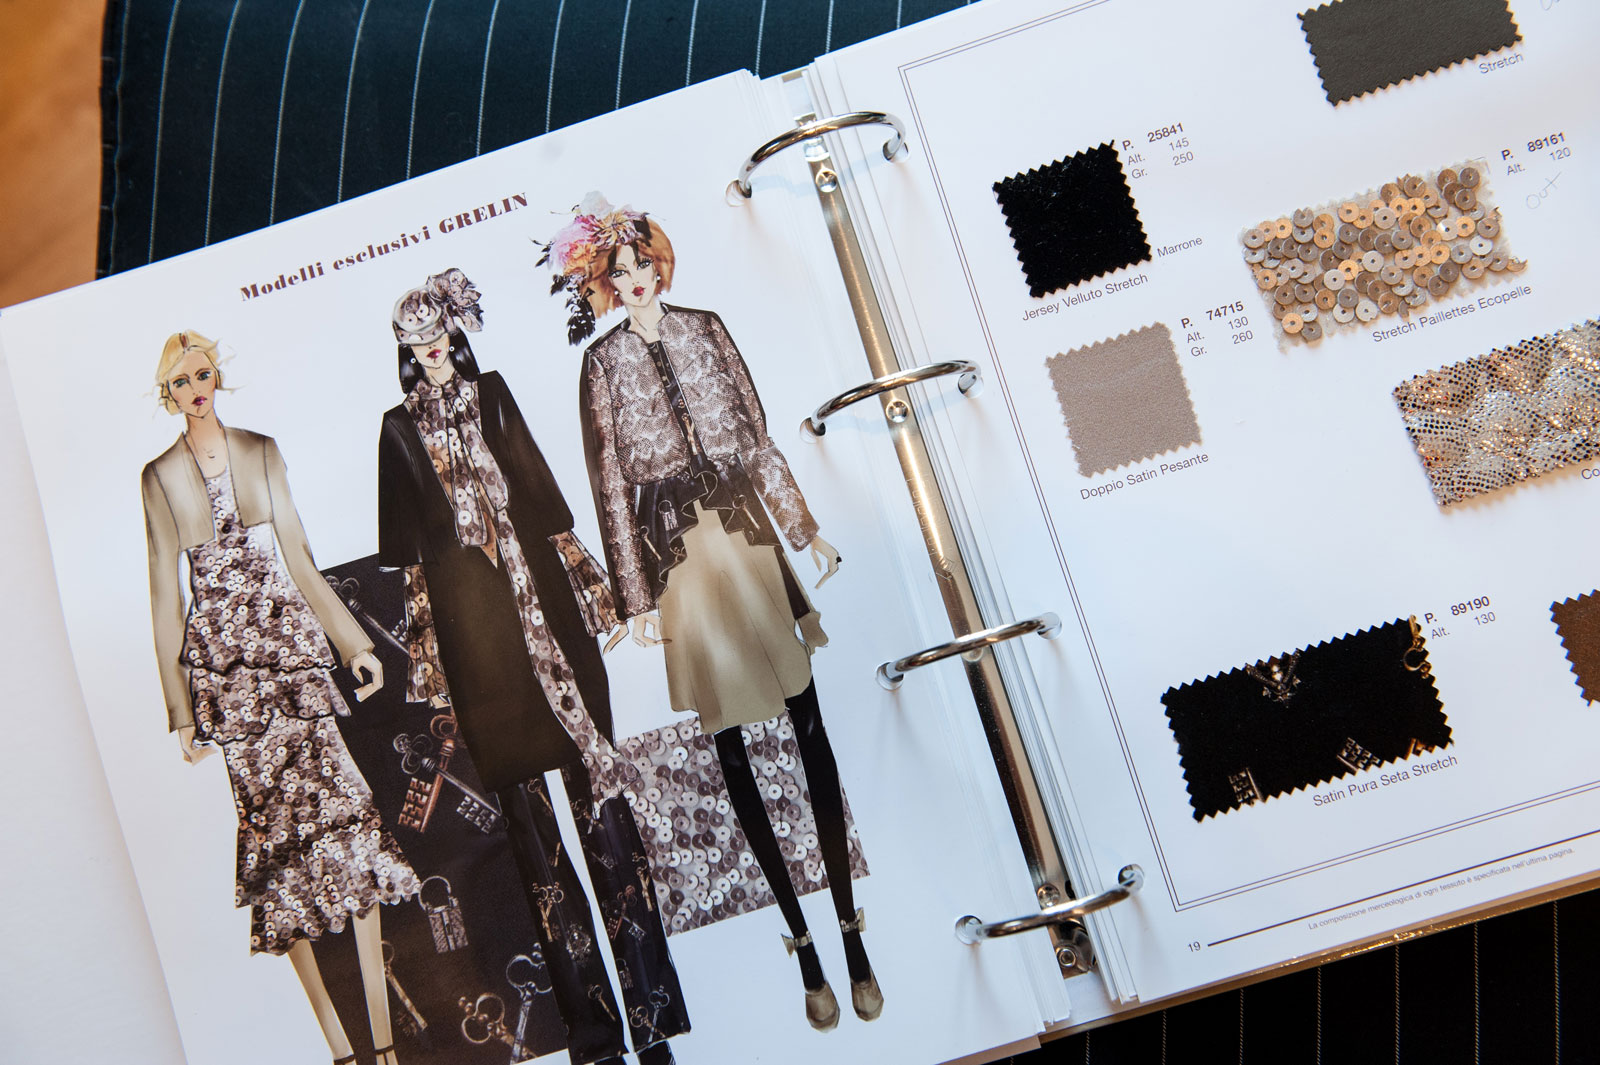 daniels-custom-clothing-minnepolis-156